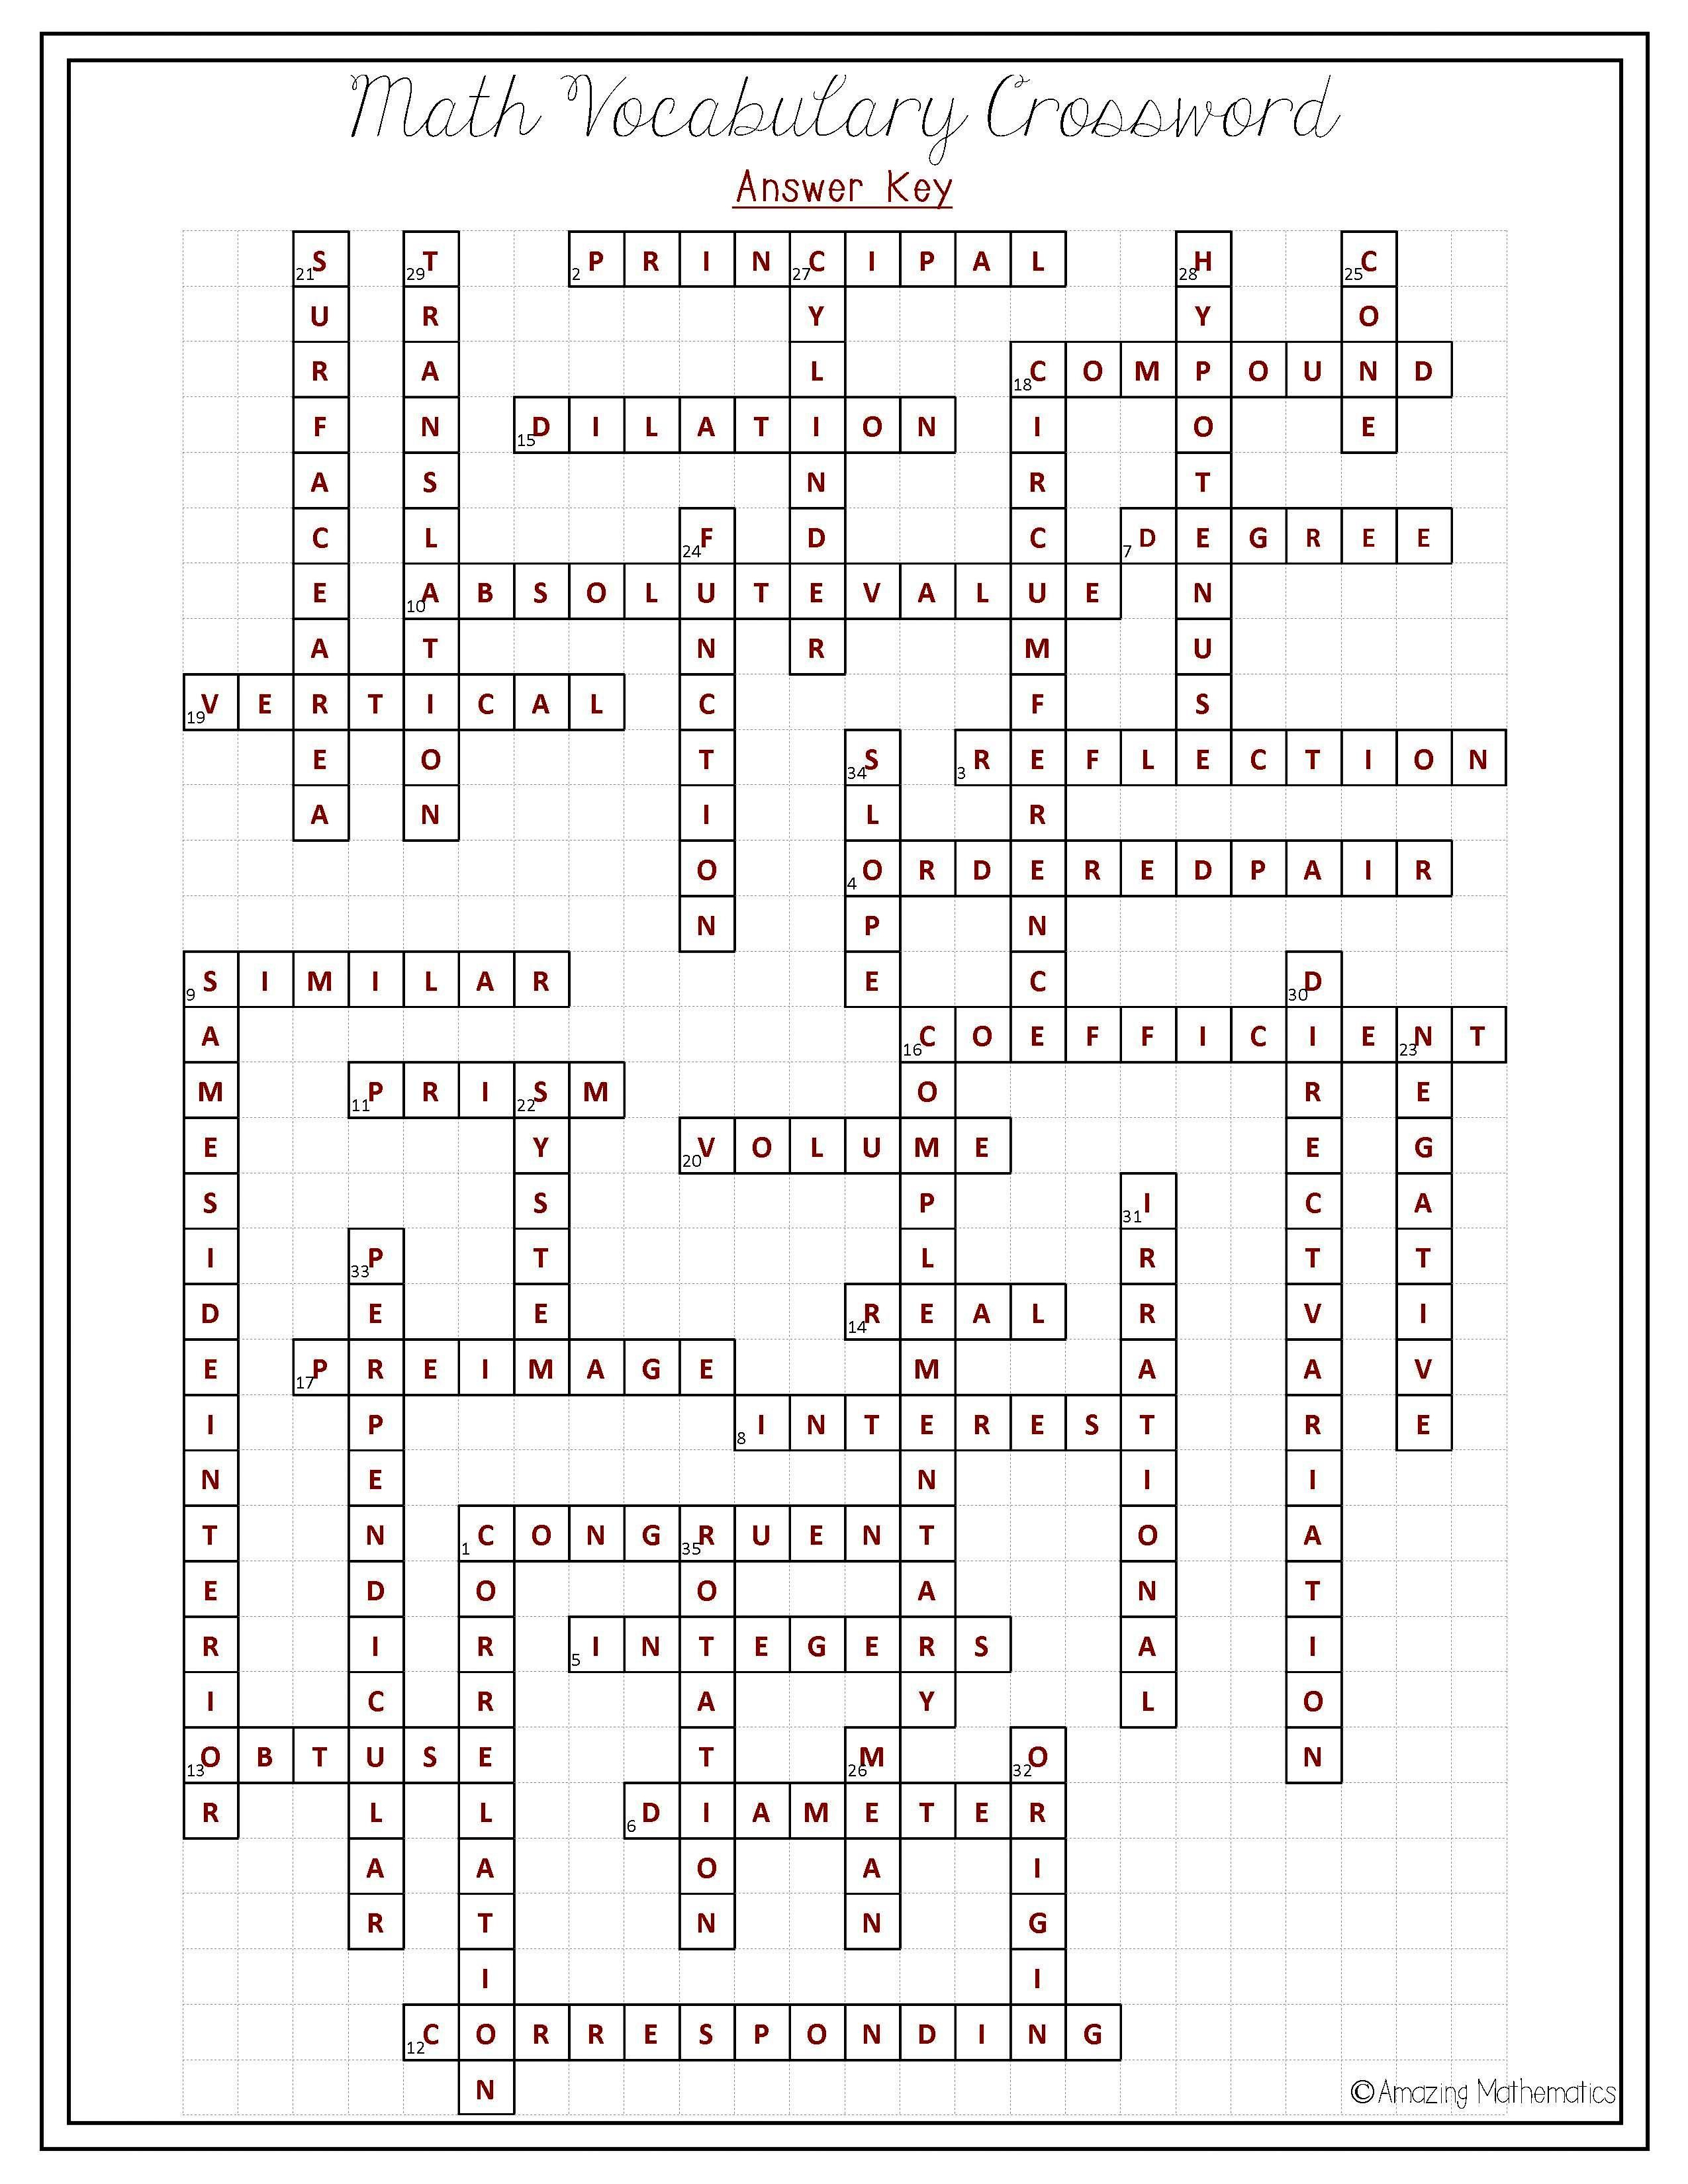 8Th Grade Math Vocabulary Crossword   Puzzles   Math Vocabulary, 8Th - Printable Math Vocabulary Crossword Puzzles